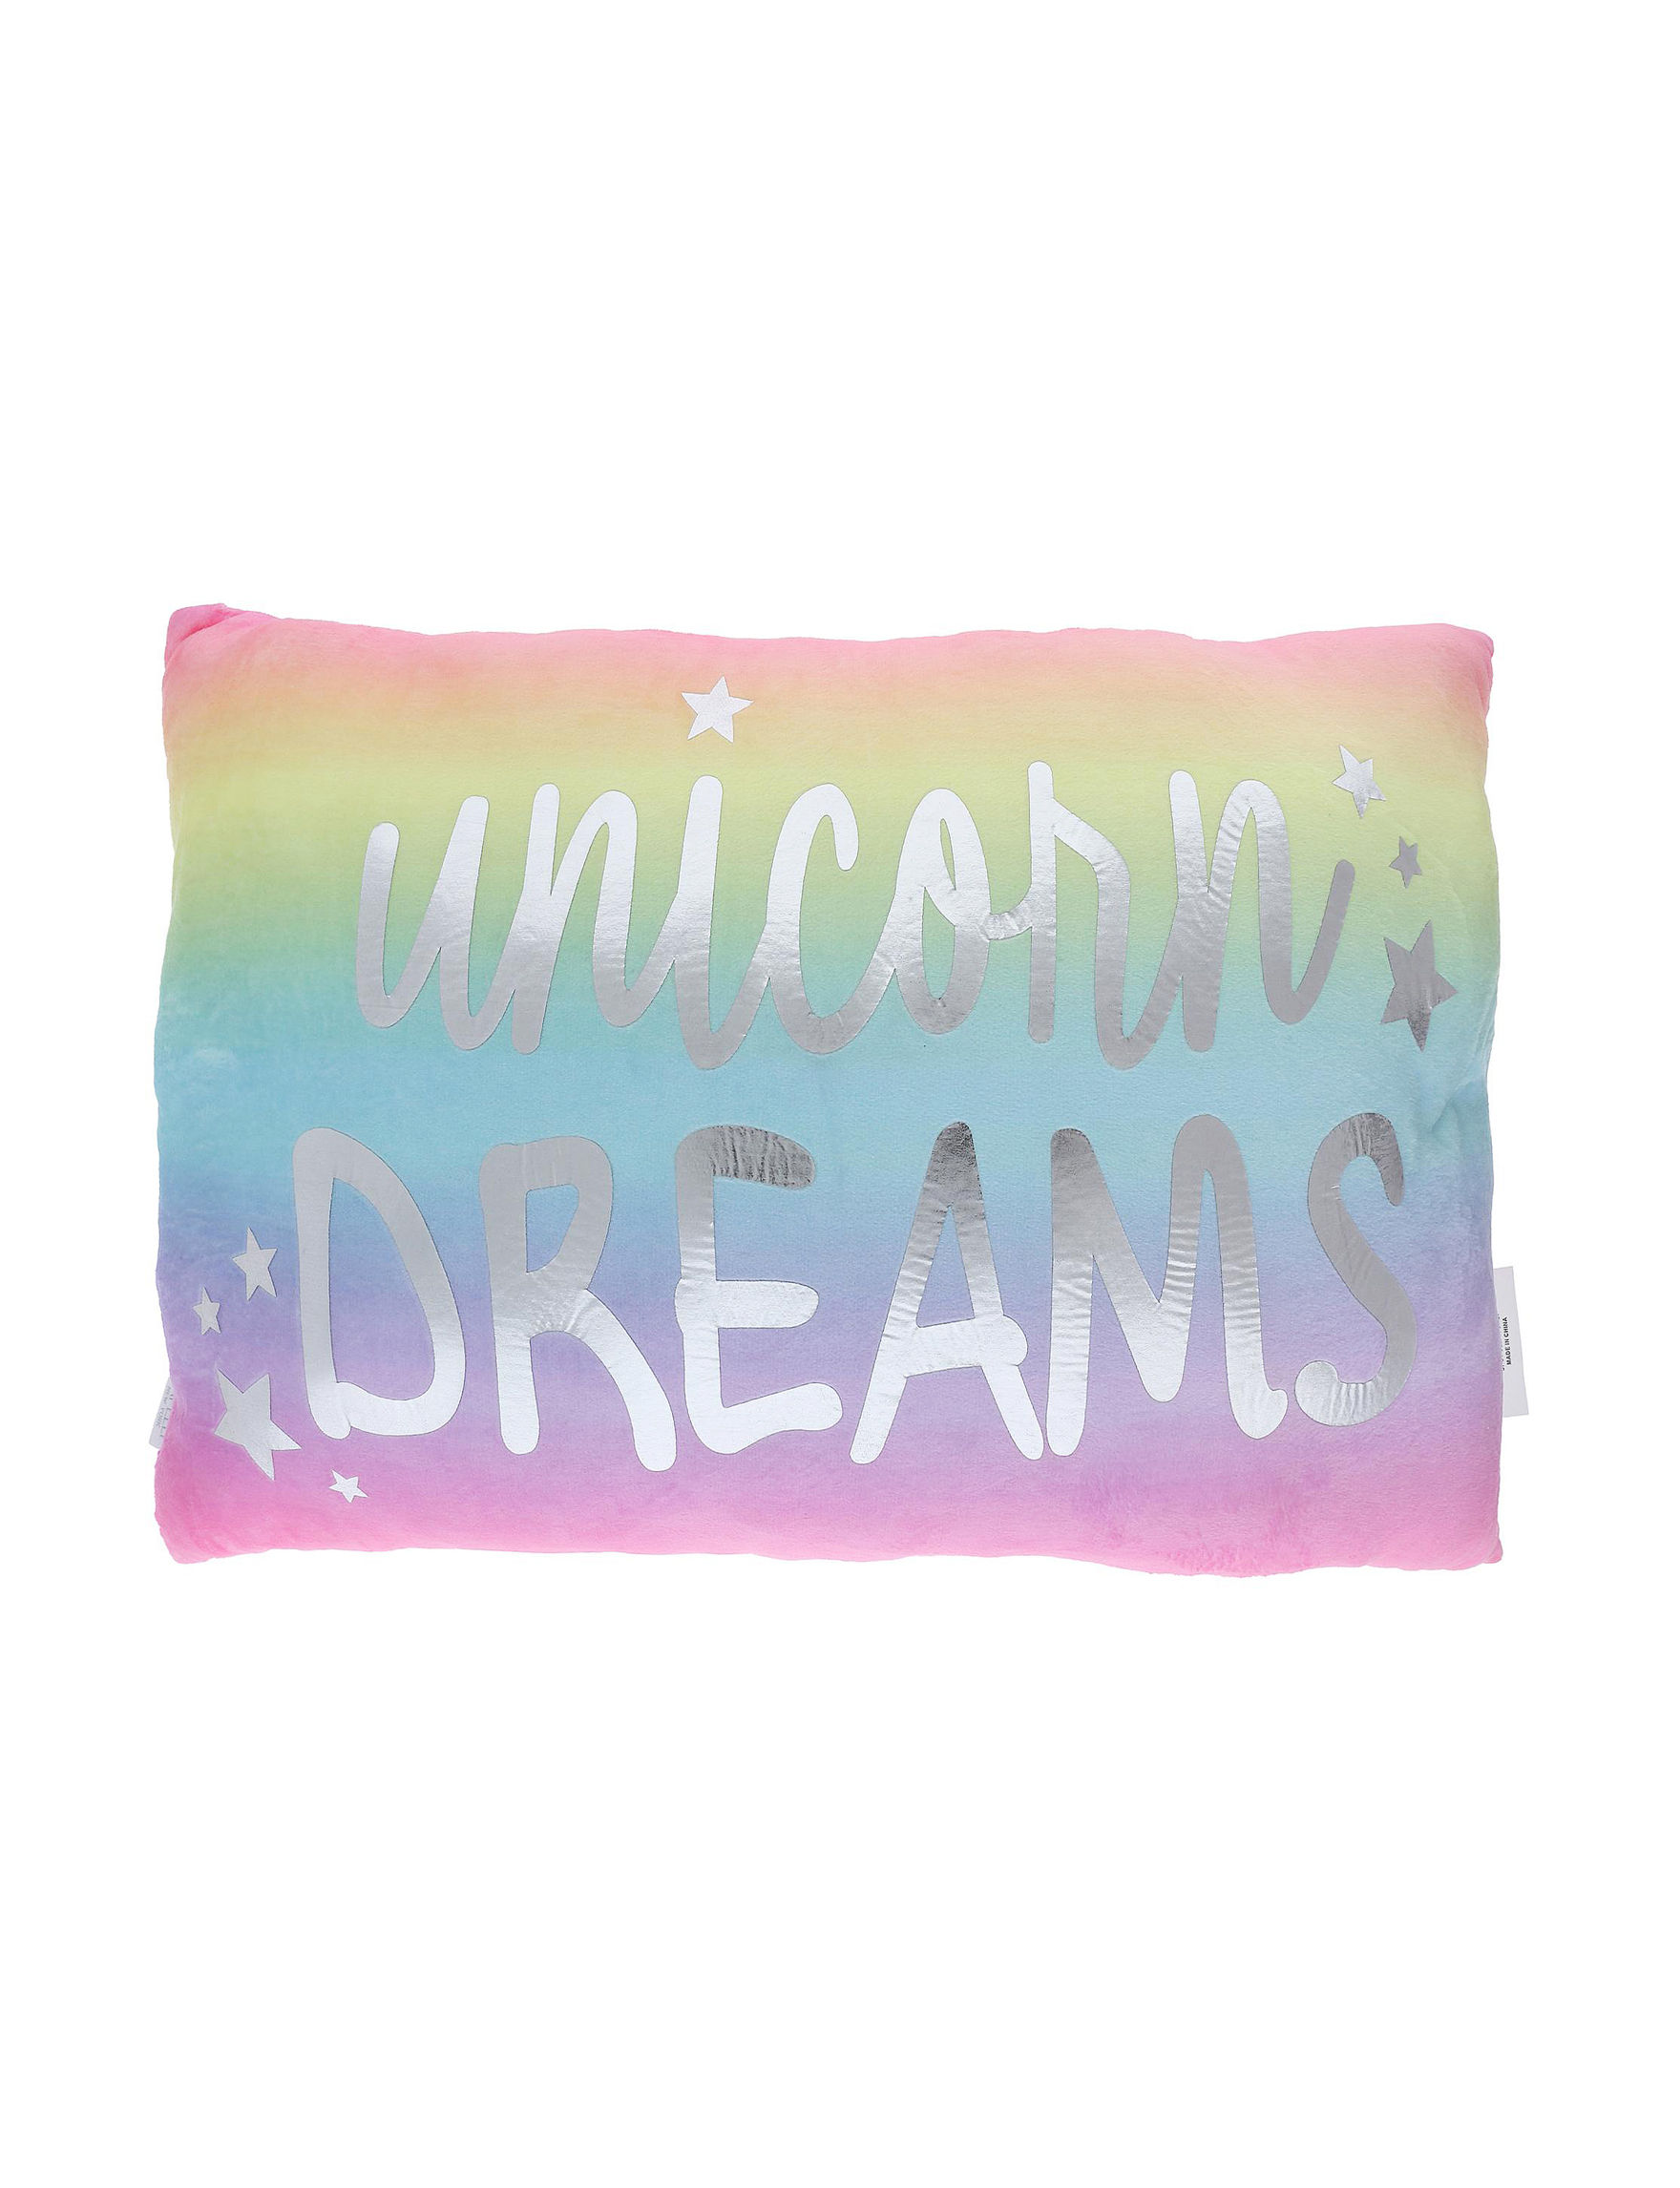 Capelli Rainbow Decorative Pillows